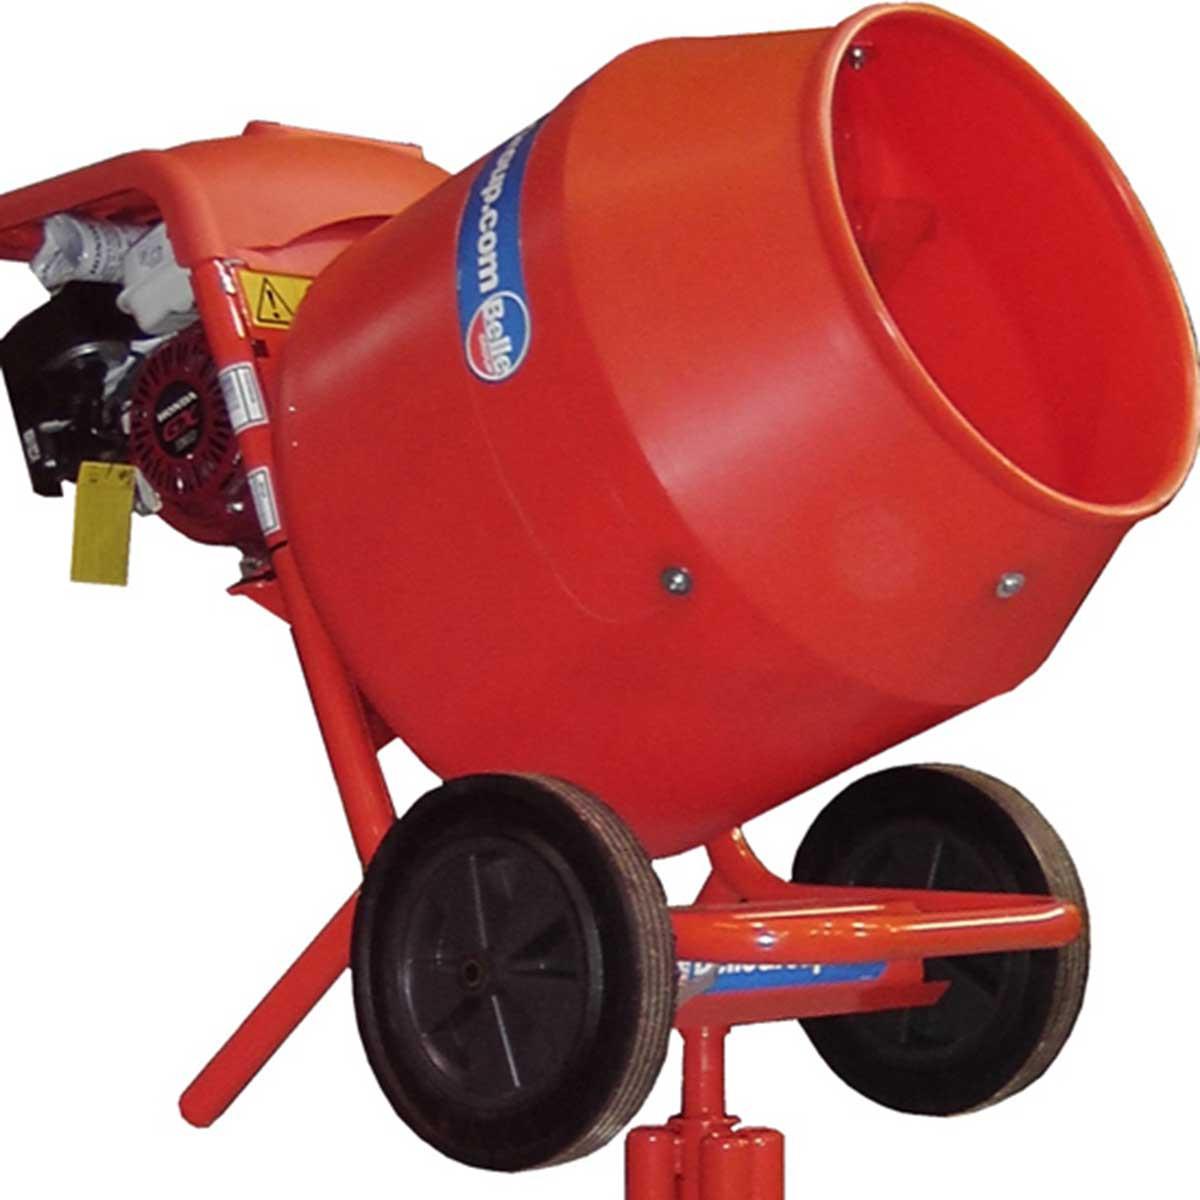 Minimix 150 Poly Drum mixer